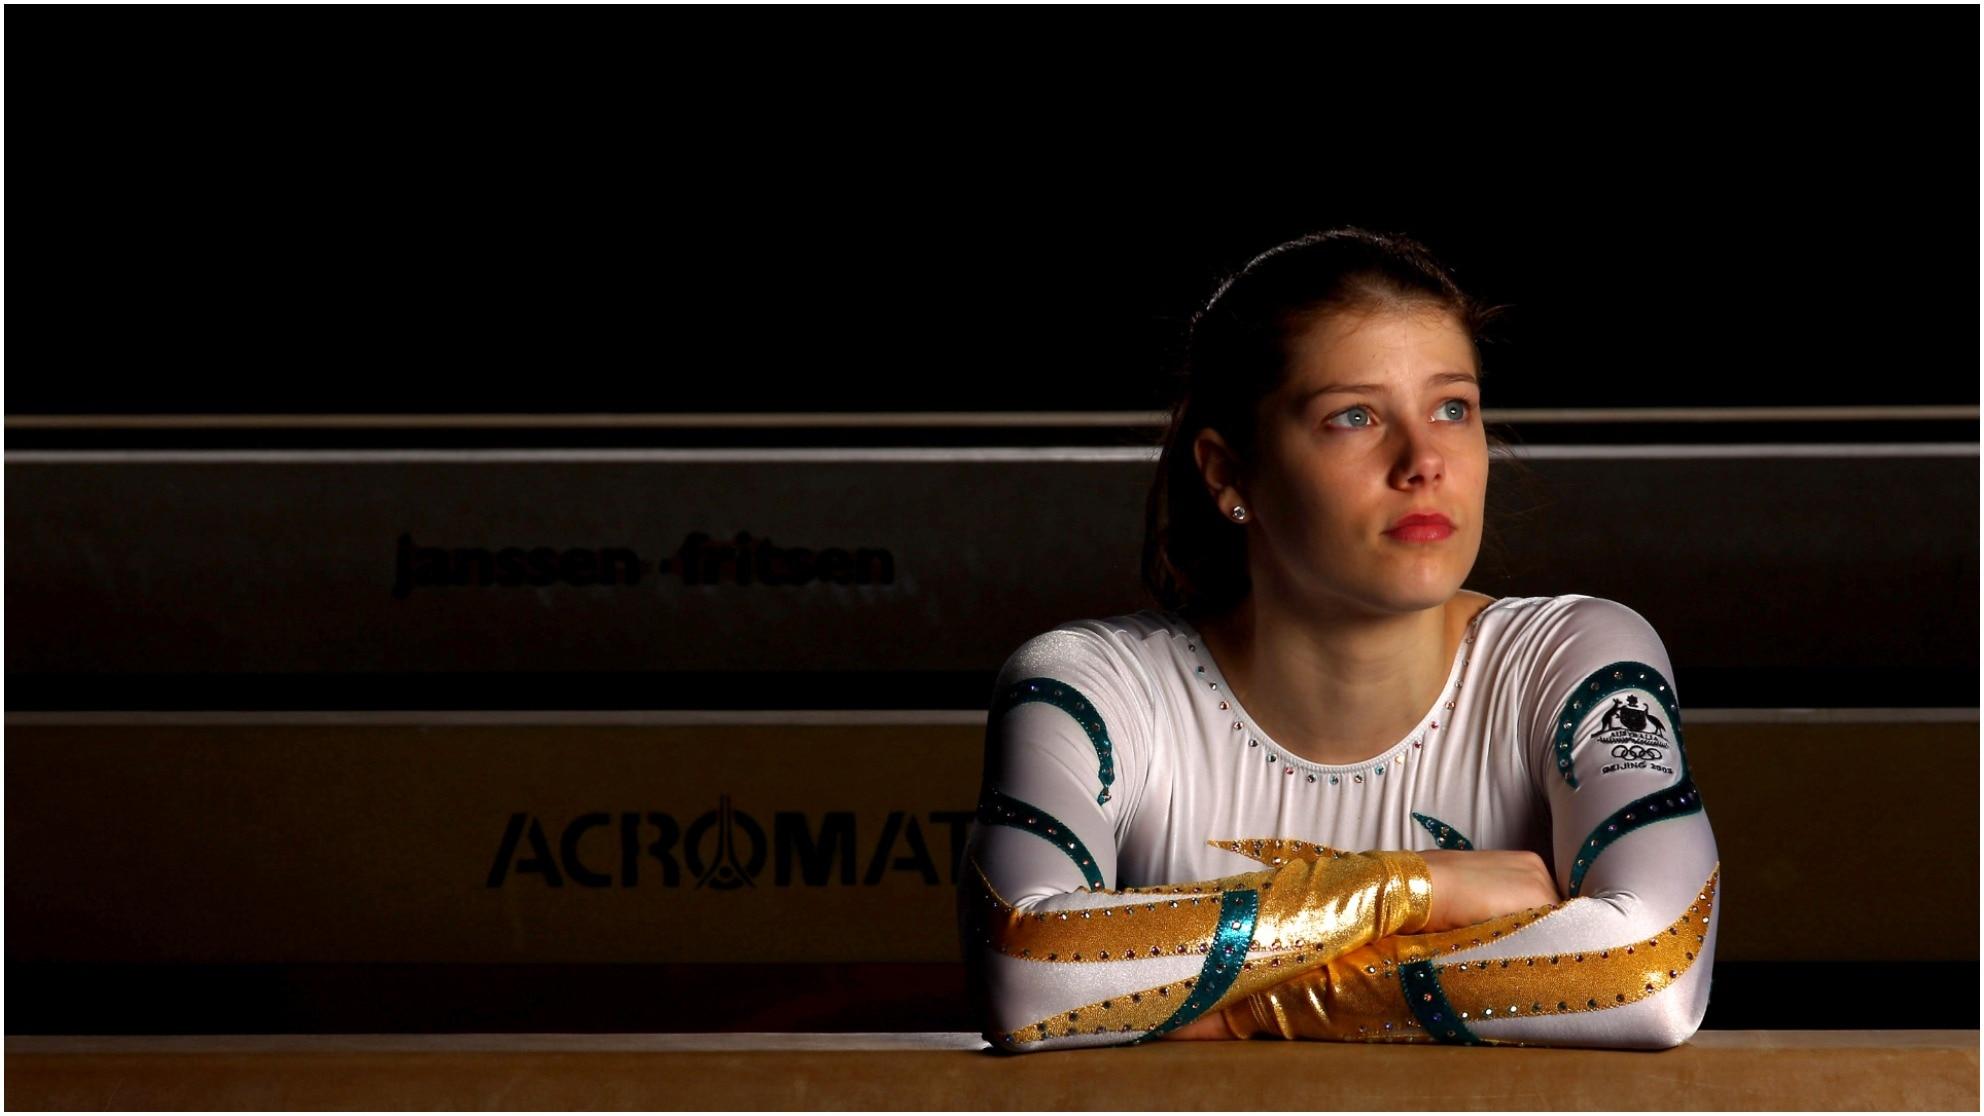 Georgia Bonora of Australia poses during a portrait session at Waverley Gymnastics Centre on August 17, 2010 in Melbourne, Australia.